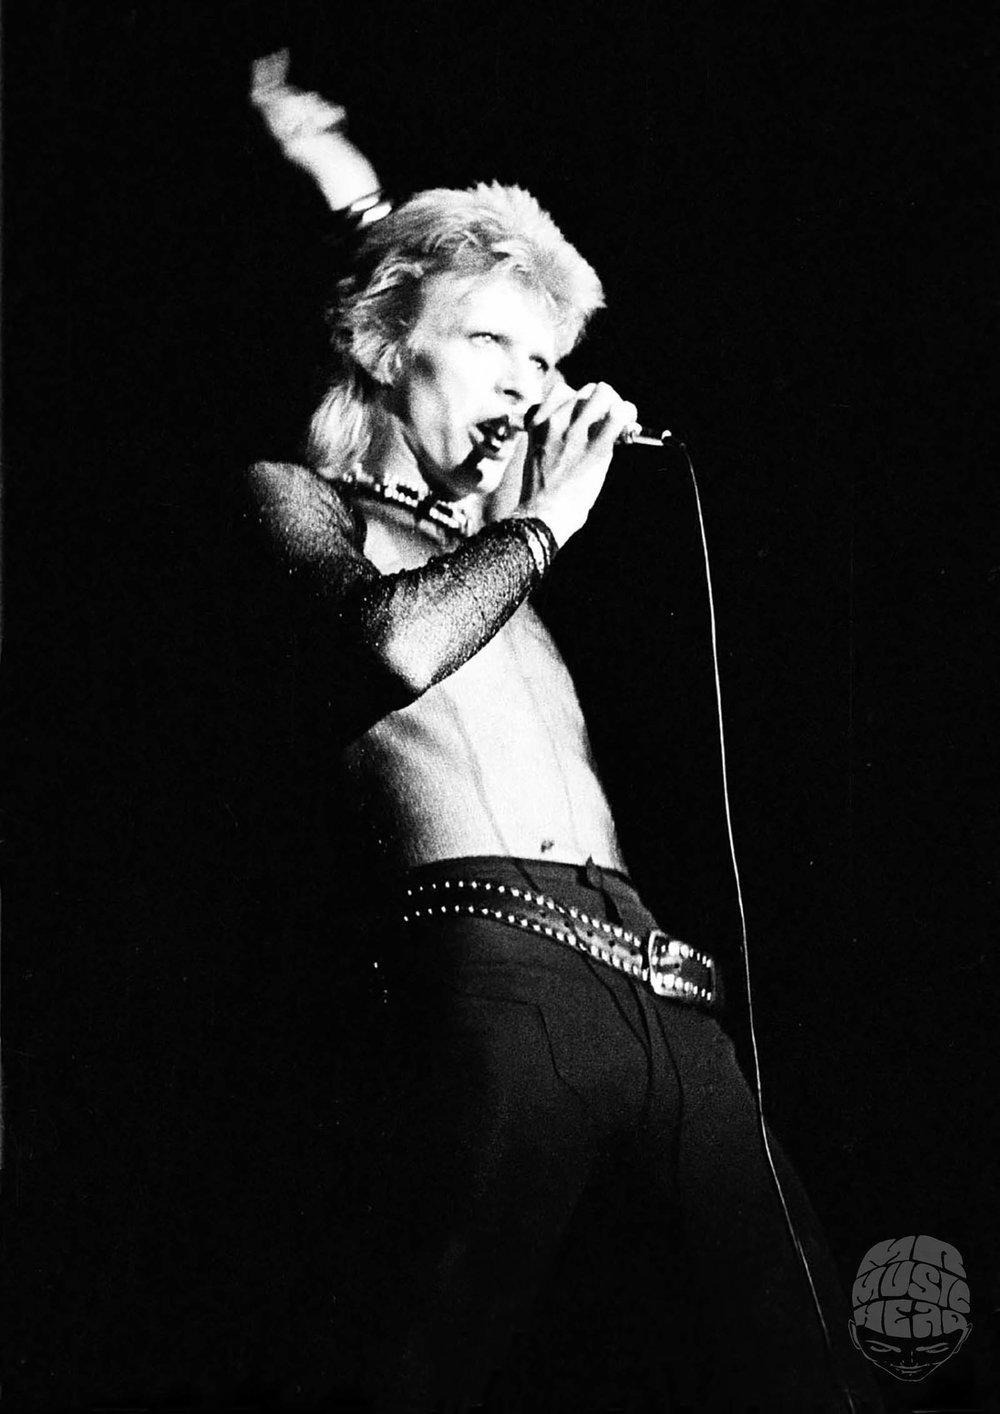 ian dickson_David Bowie 1973_.jpg